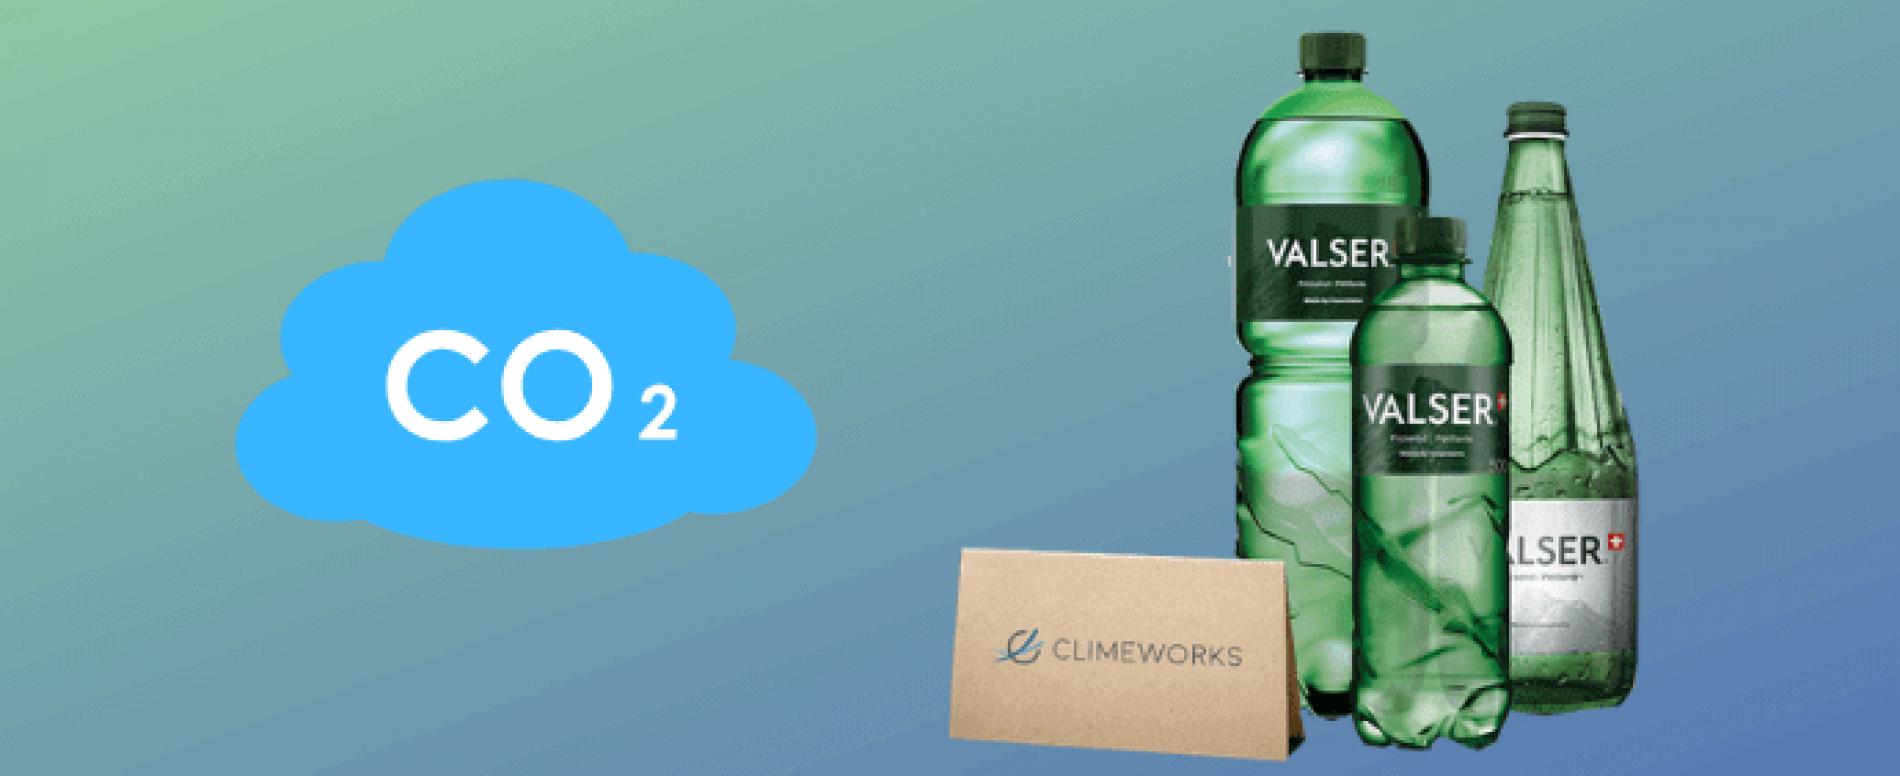 Acqua Valser (Coca-Cola) userà anidride carbonica succhiata dall'aria